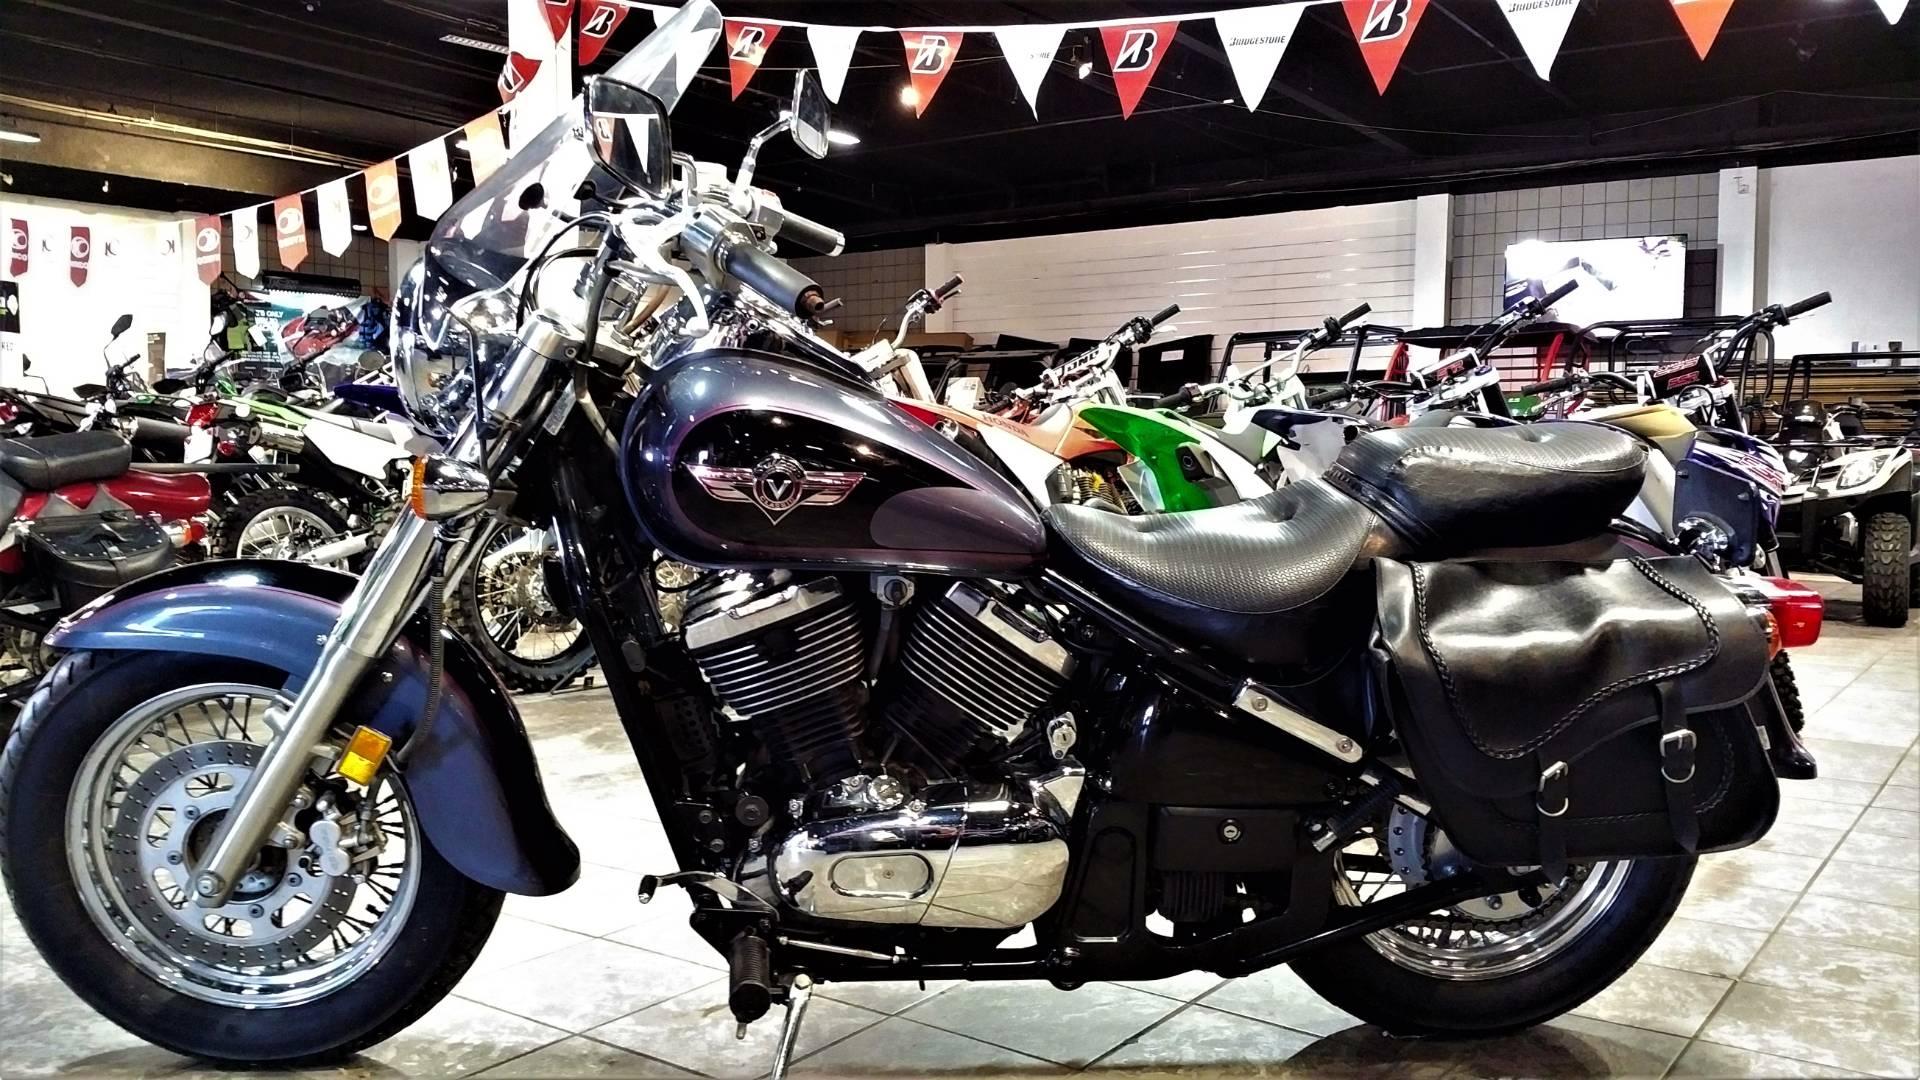 1999 Kawasaki Vulcan 800 Classic In Salinas California